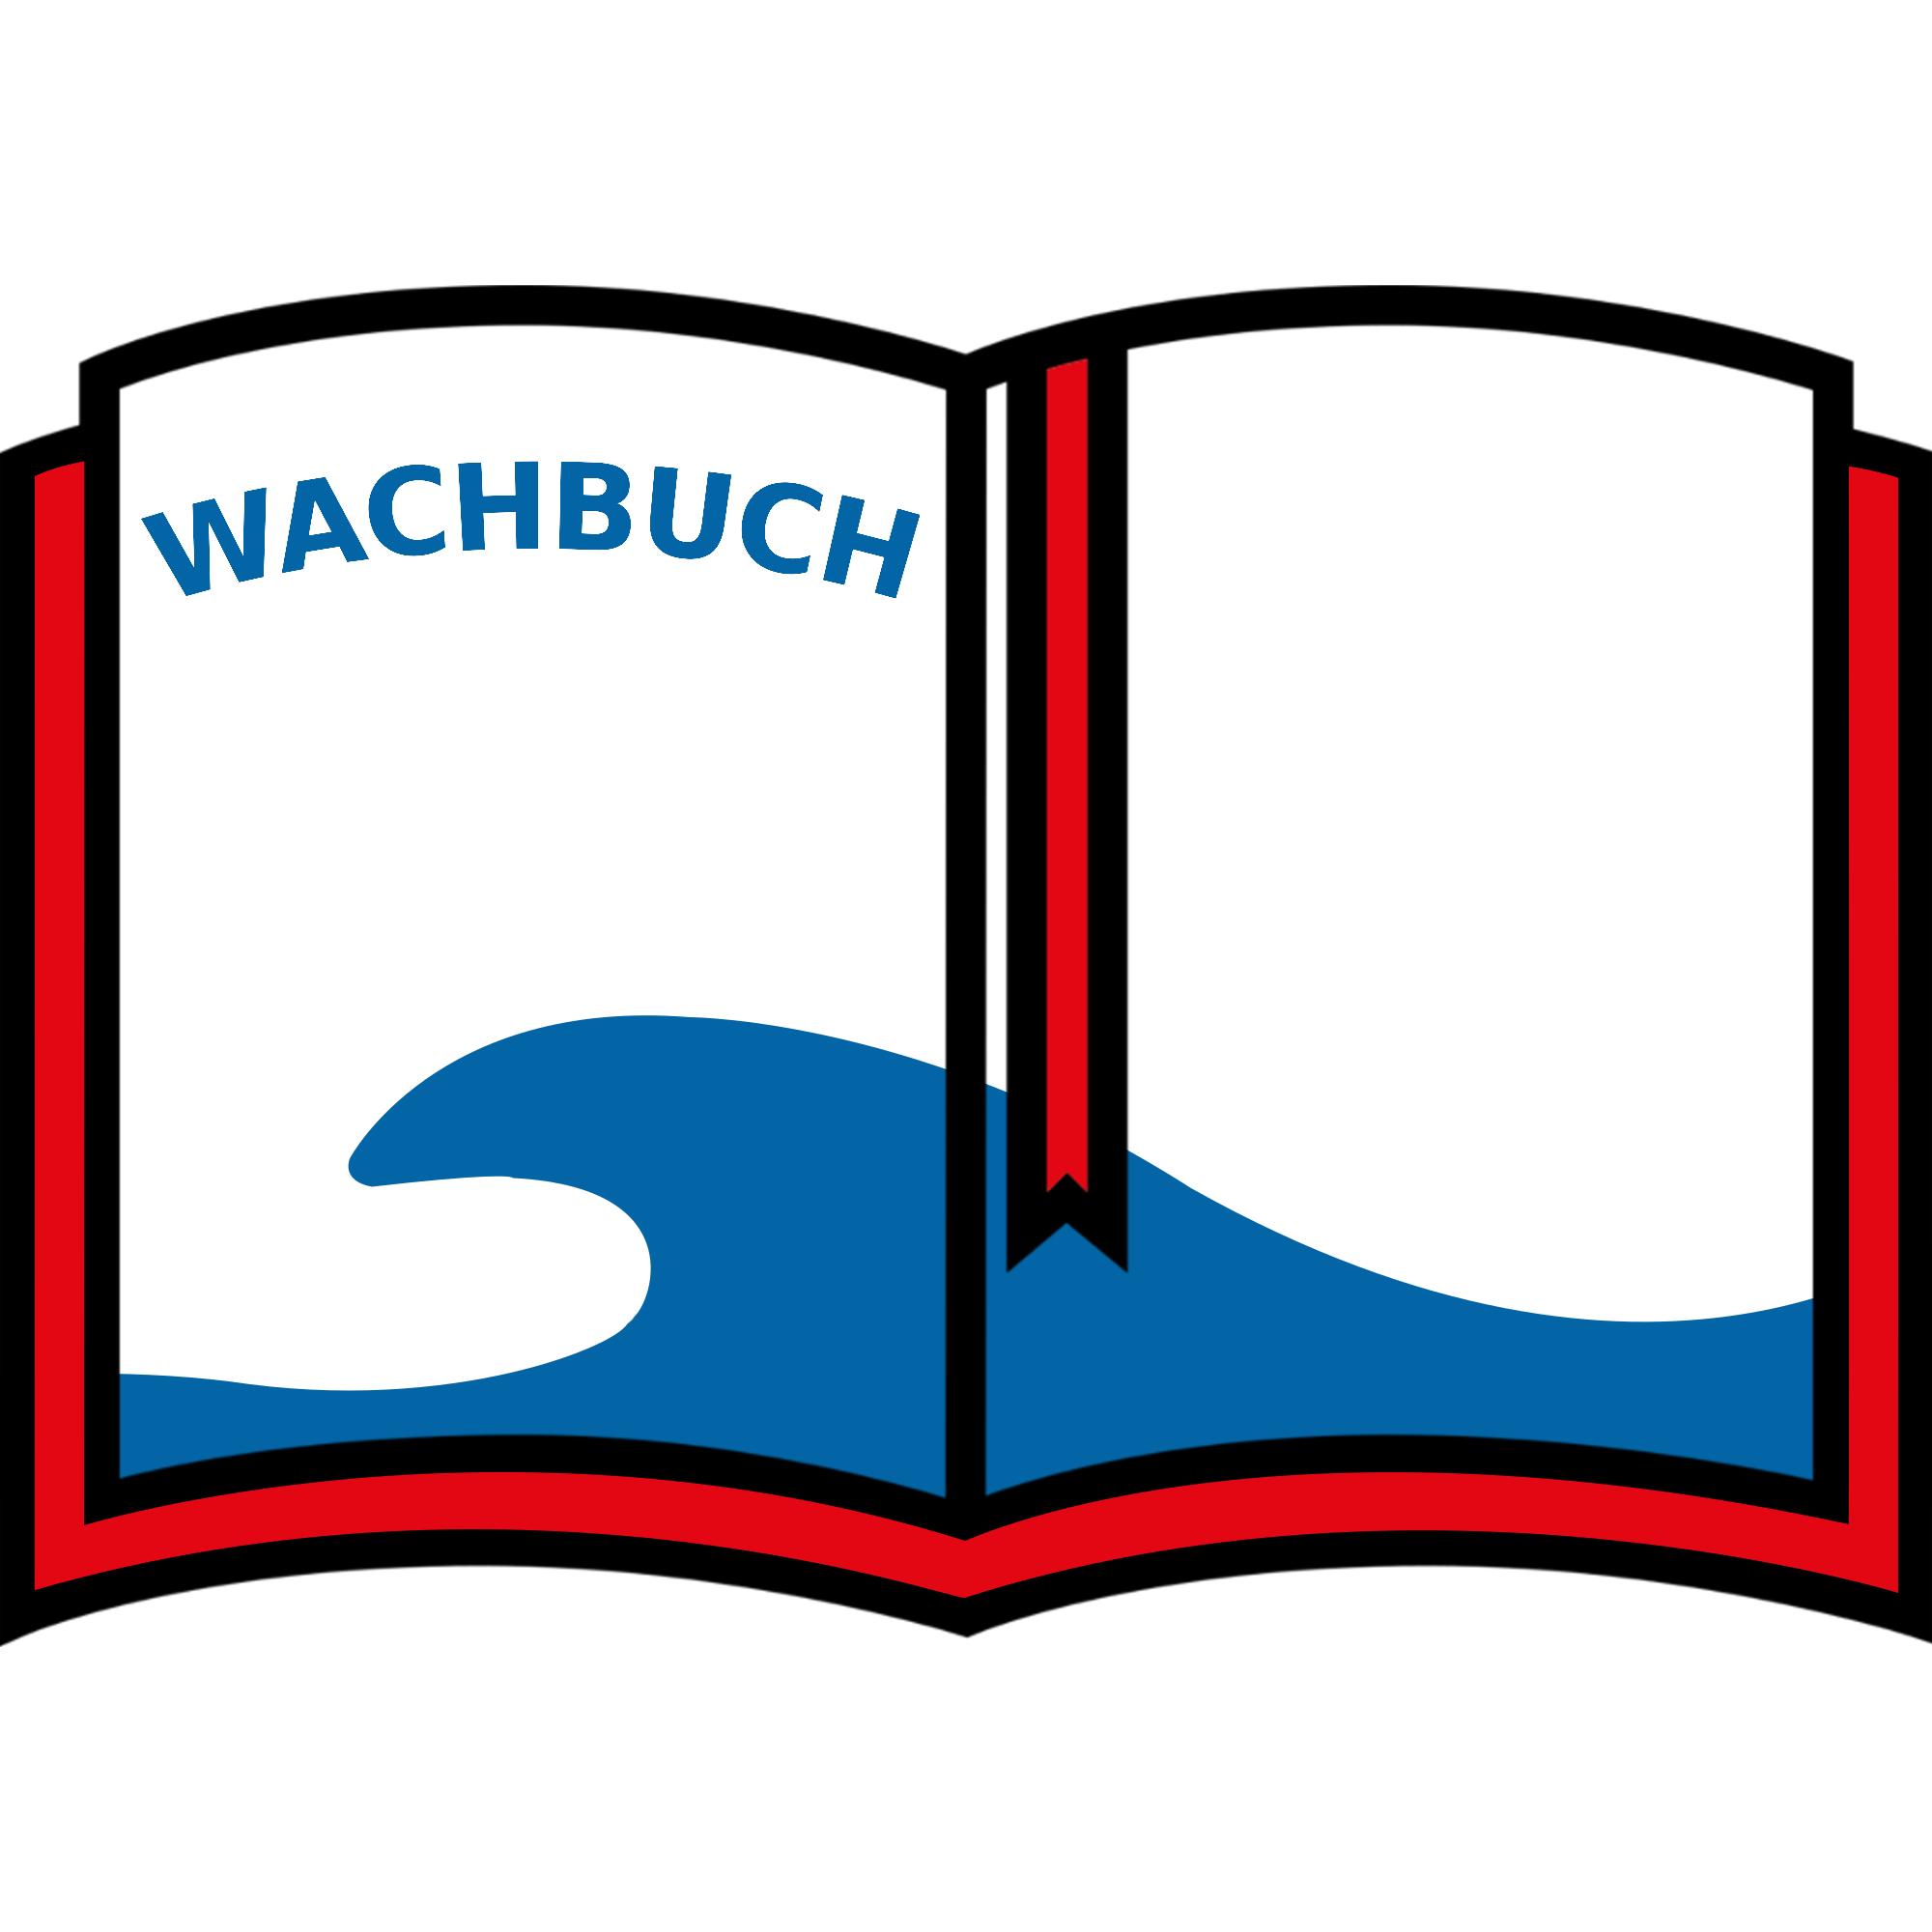 Wachbuch Logo